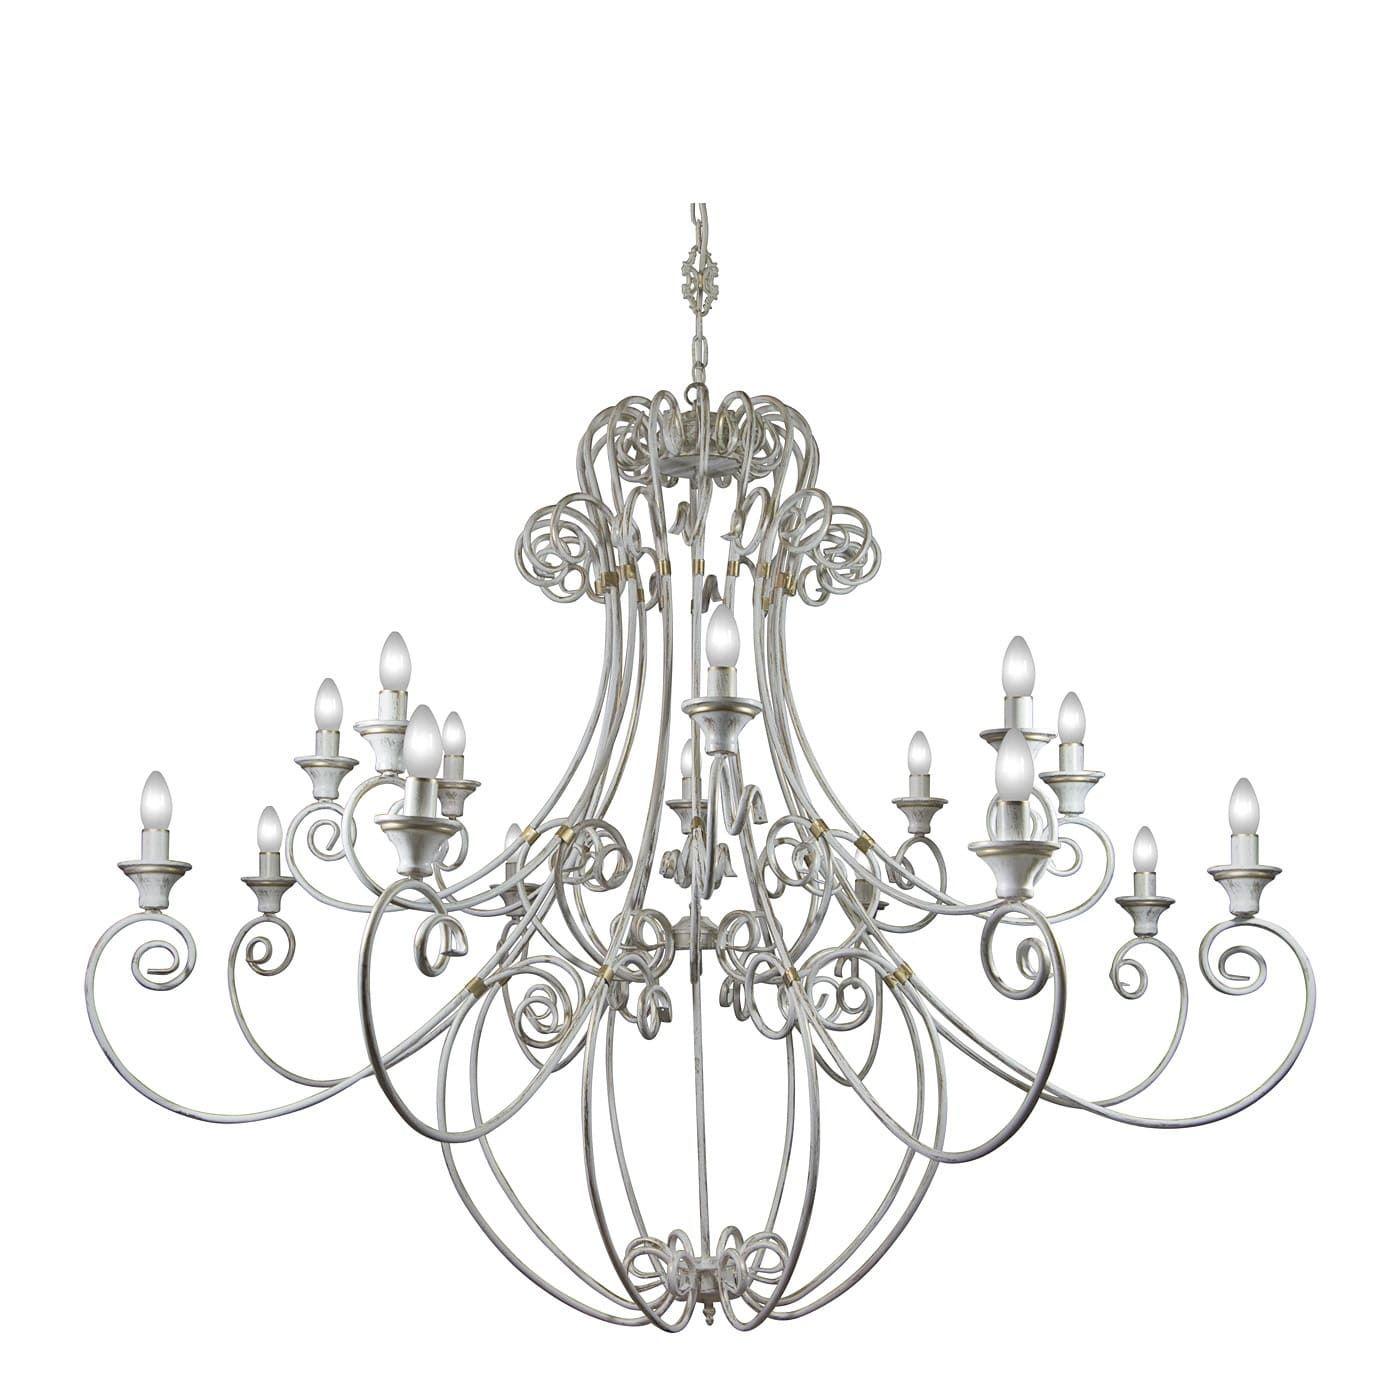 PETRASVET / Pendant chandelier S3021-21, 21xE14 max. 60W